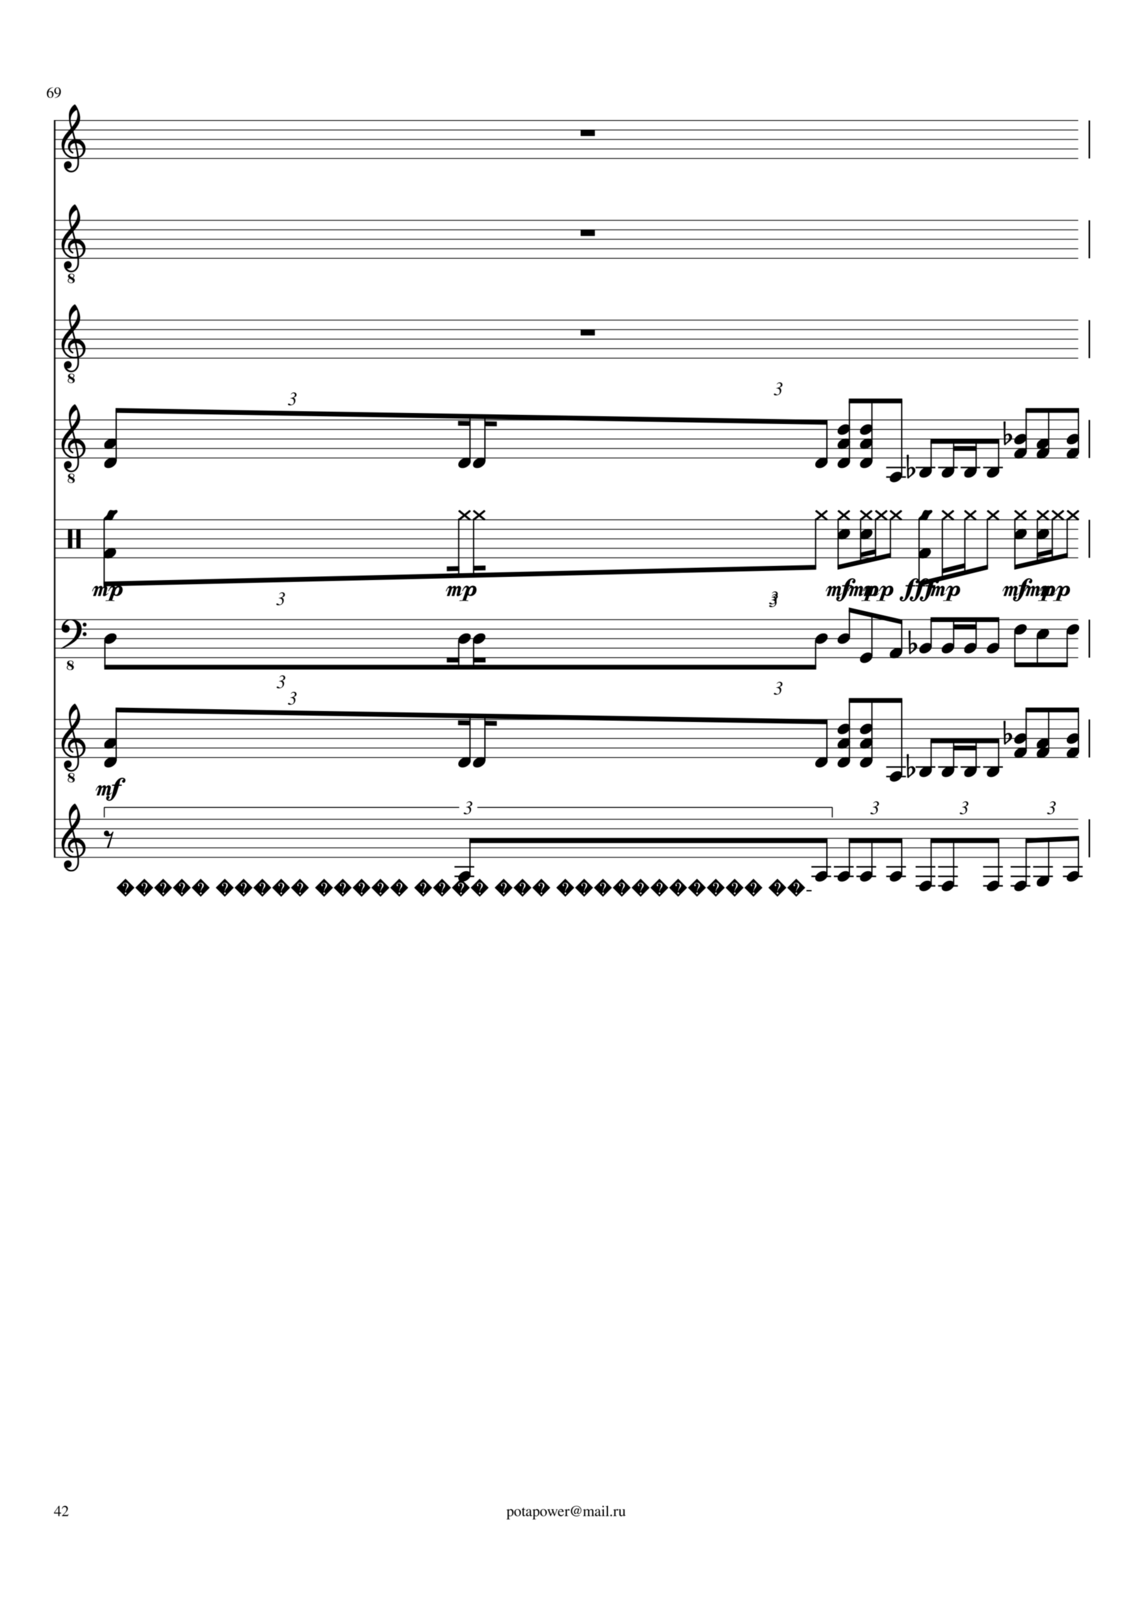 Korolevstvo slez slide, Image 42